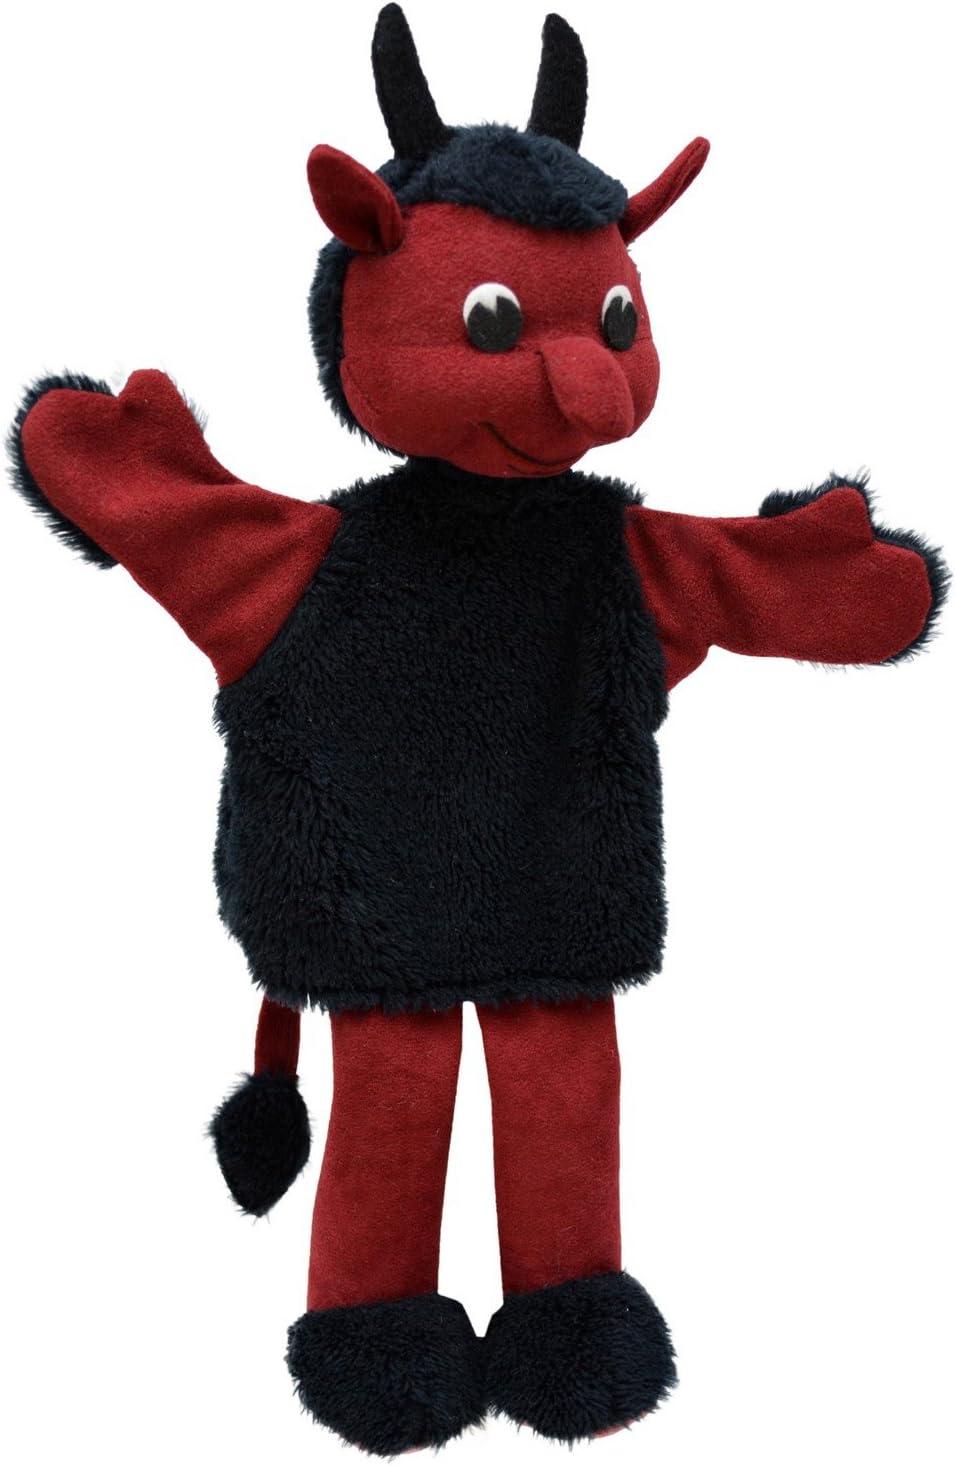 ABA 71182 ABA Devil Hubert Hand Puppet ABAX5 33 cm Multi-Color